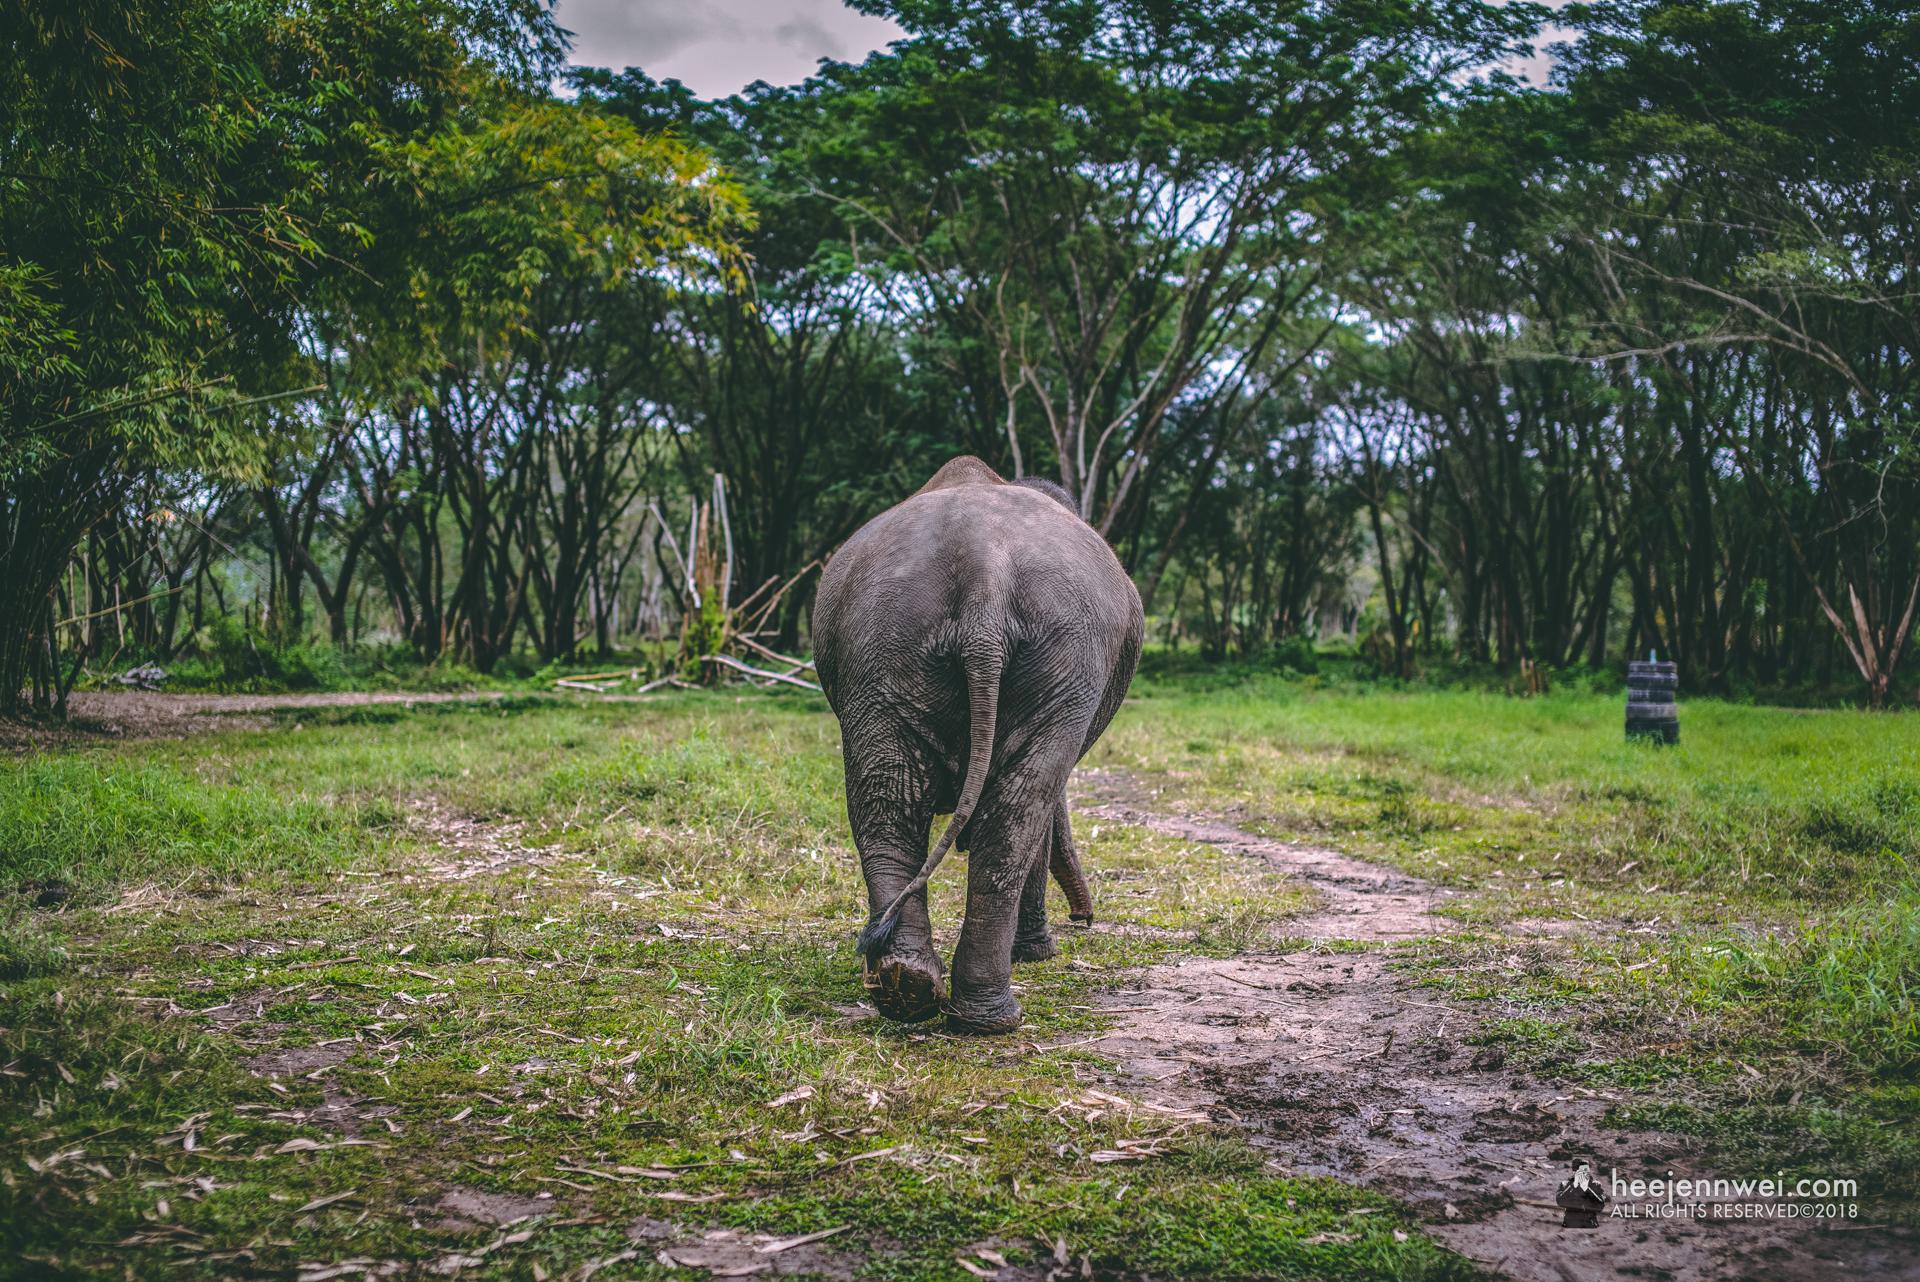 Good bye elephant valley!